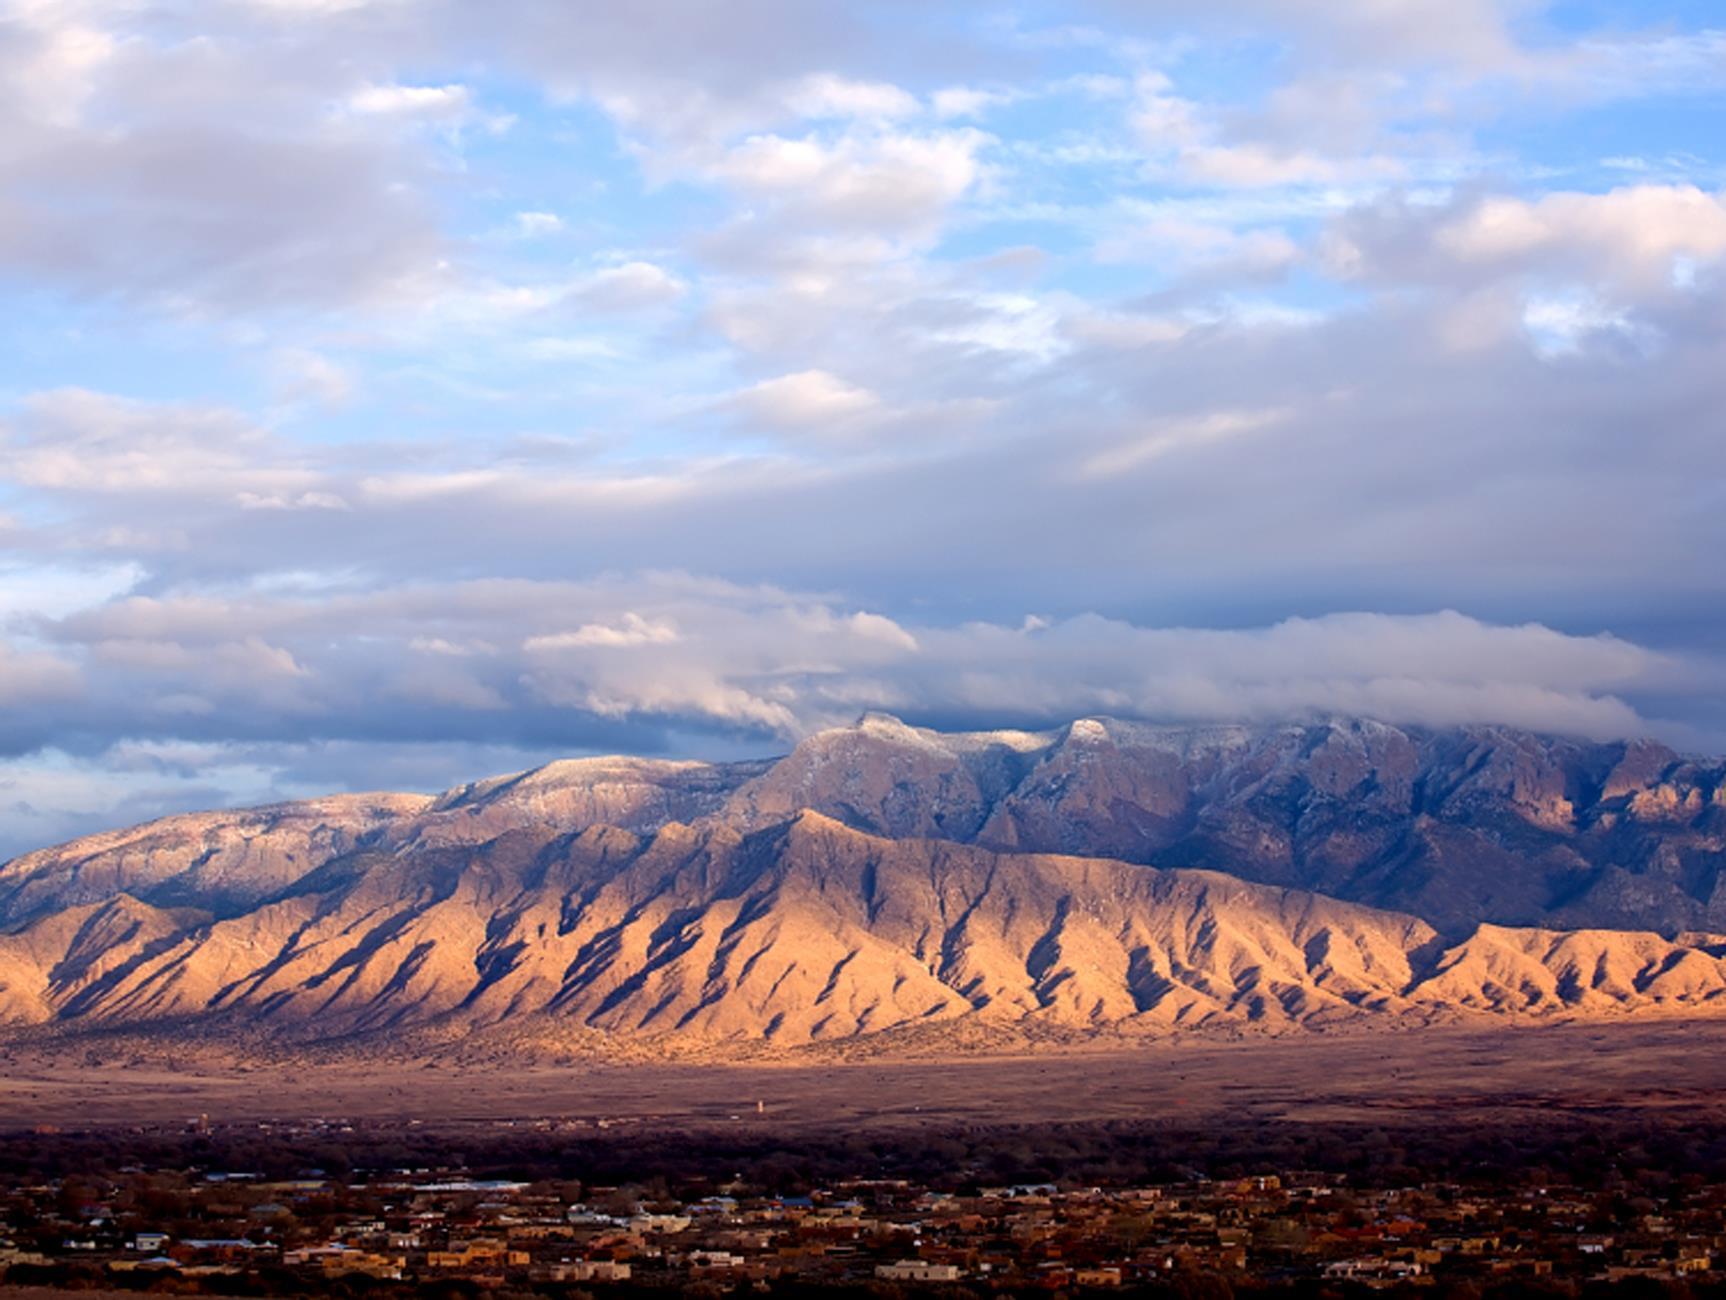 The Sandia Mountains east of Albuquerque, New Mexico